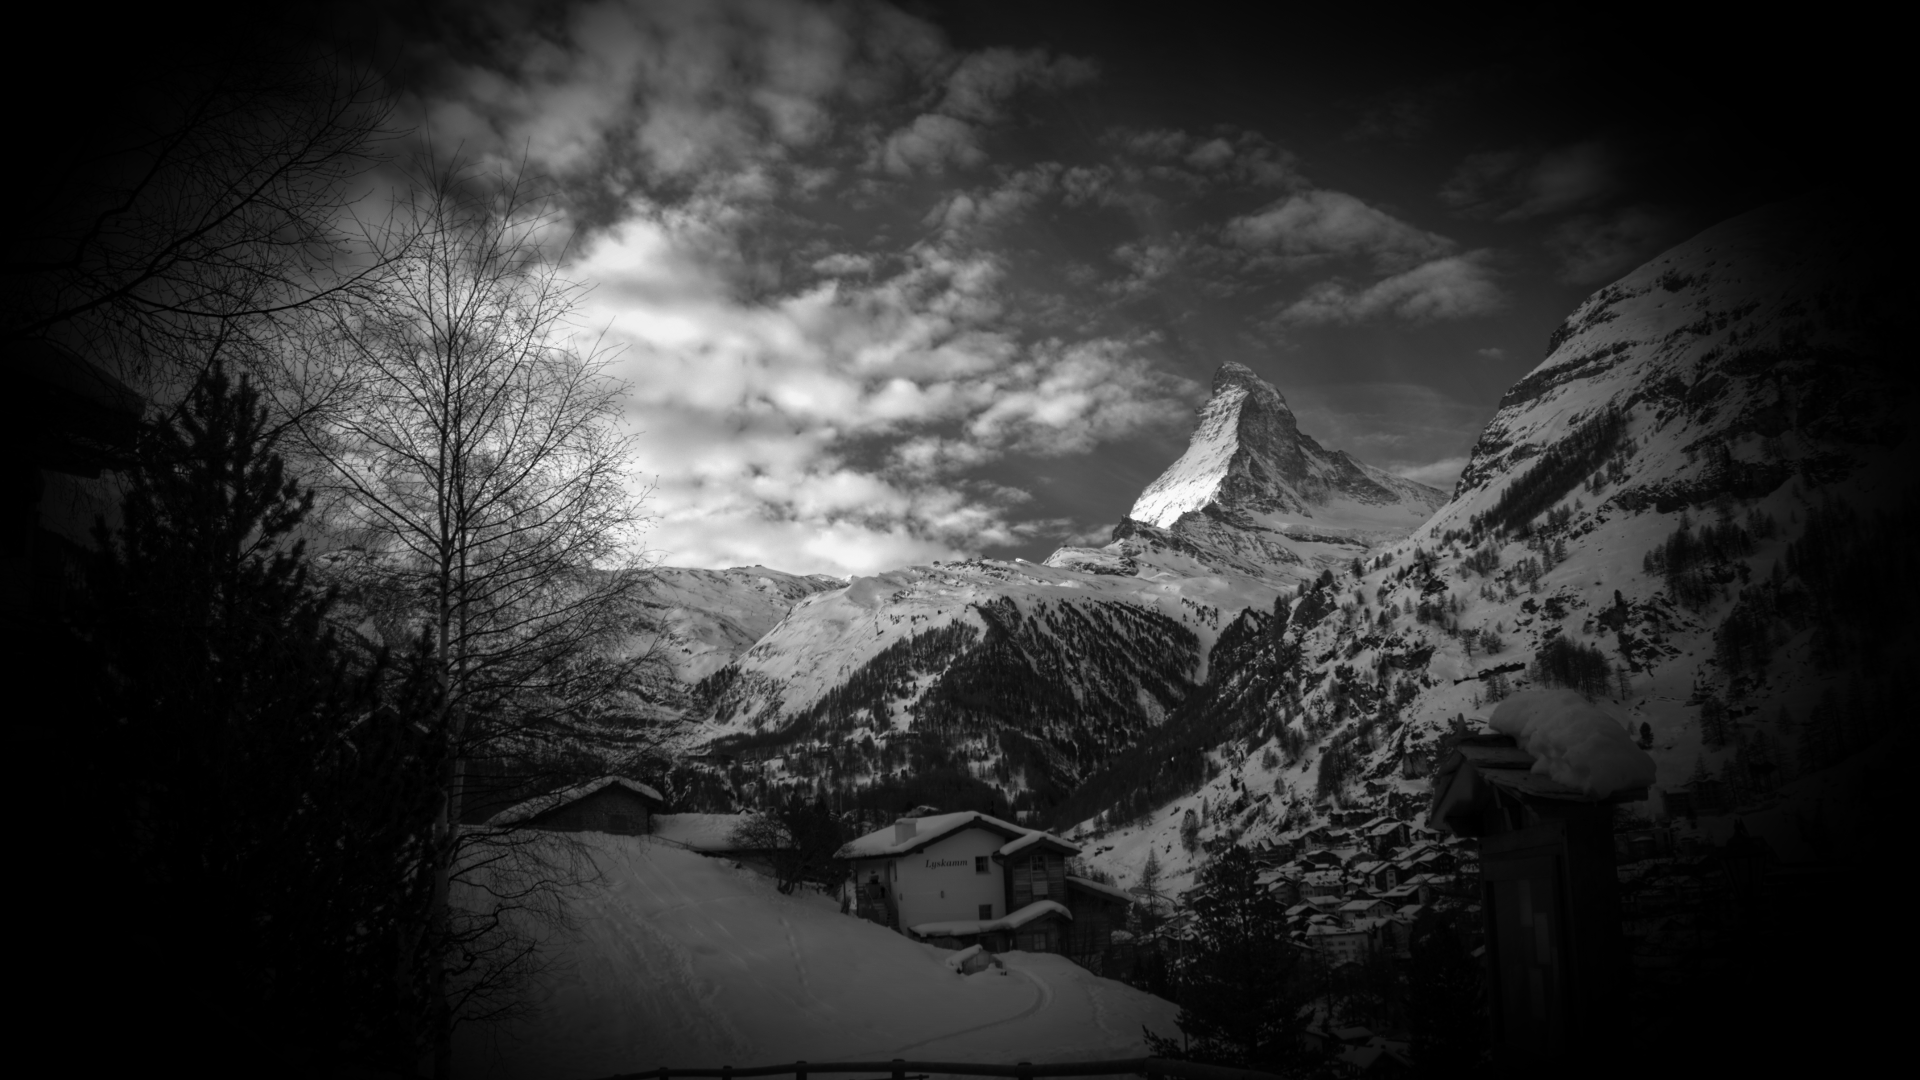 General 1920x1080 mountains nature monochrome gray Switzerland Matterhorn Alps winter snow trees landscape house